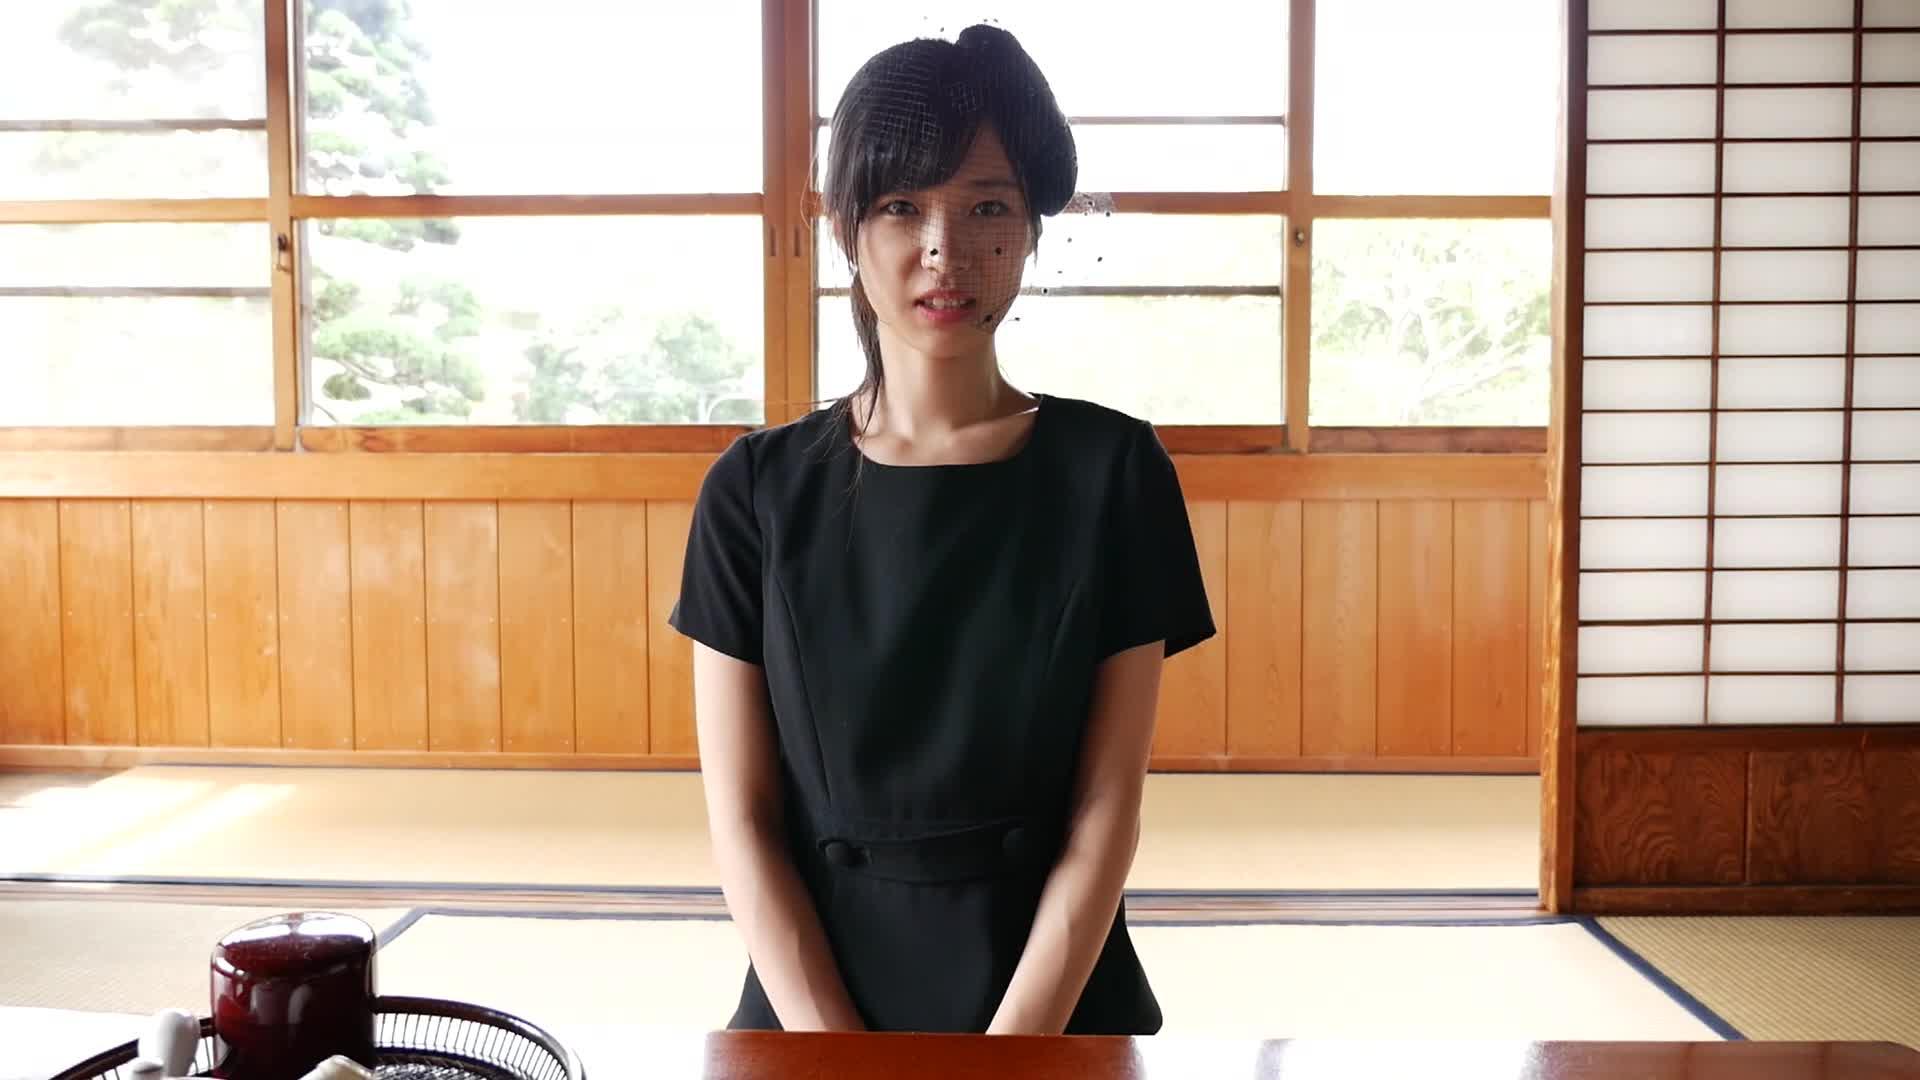 c15 - みすど 魅惑の透明感/宮脇麻那